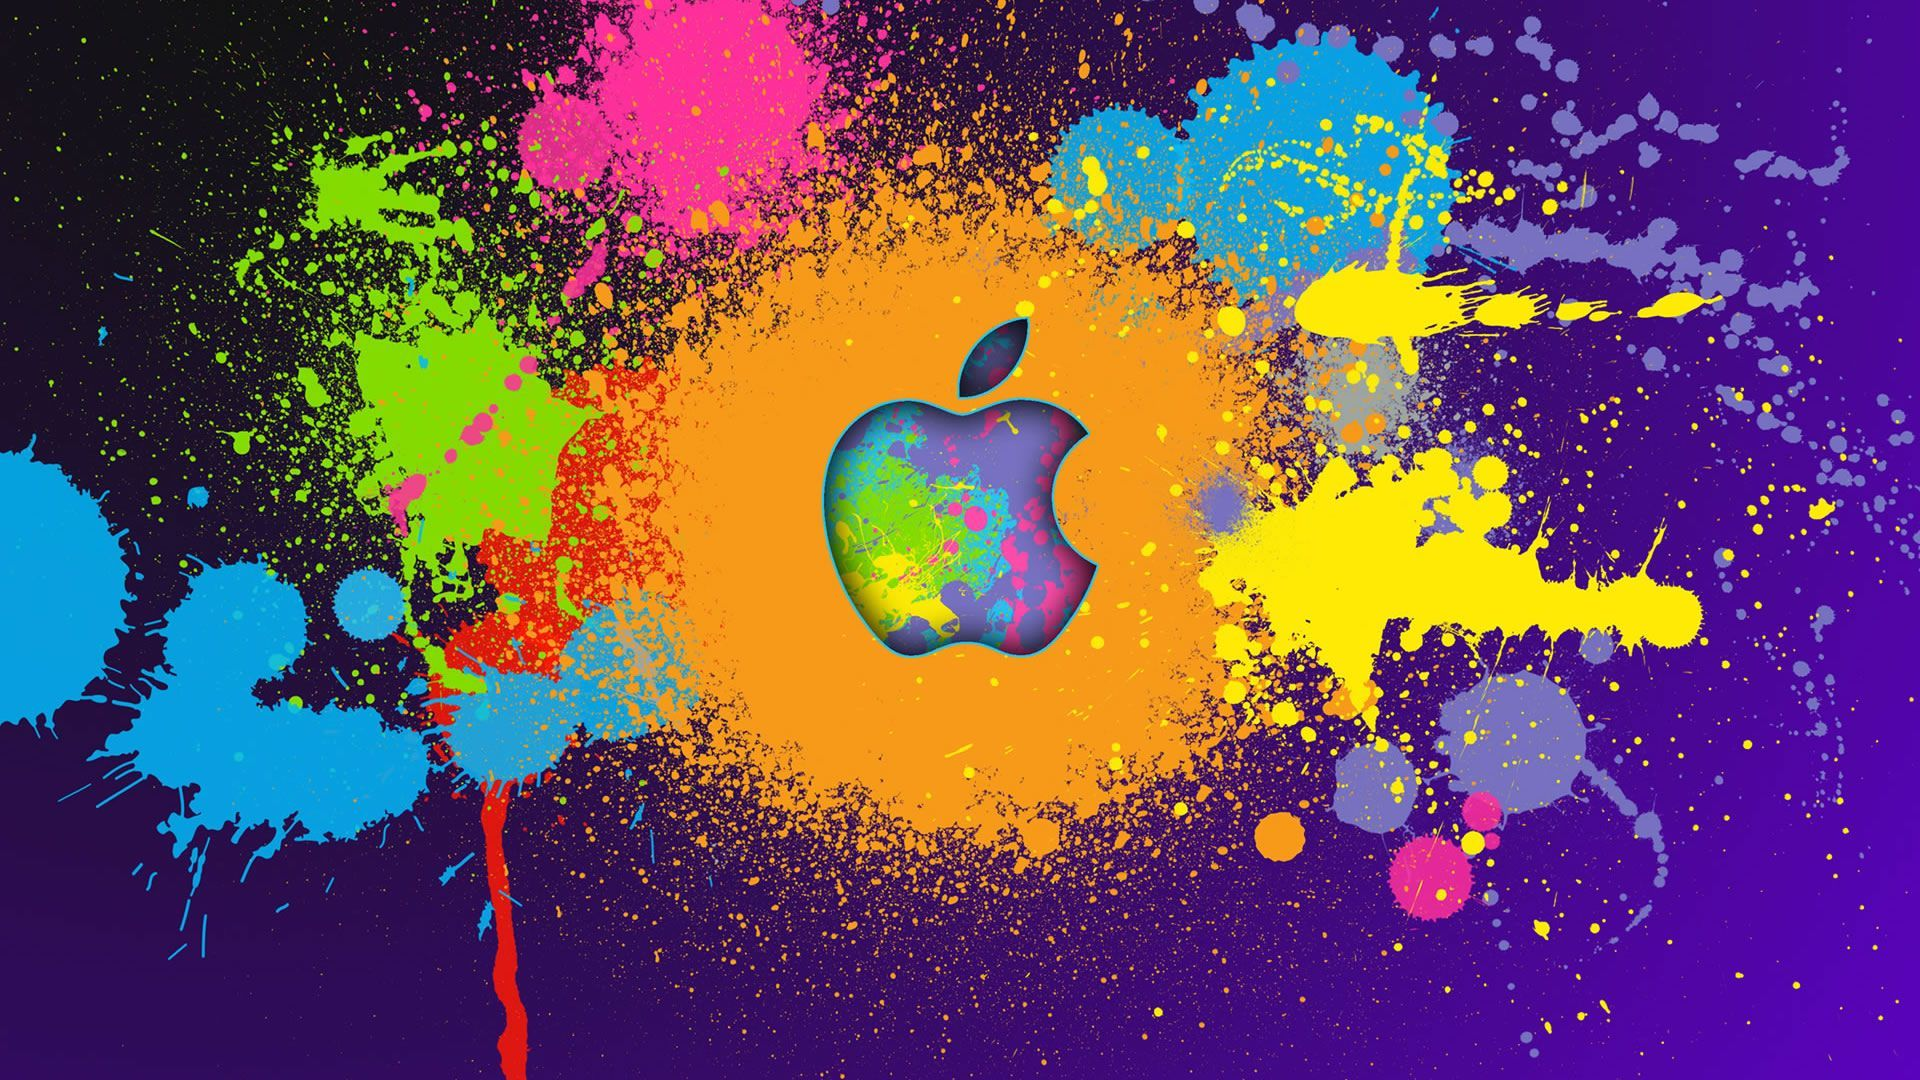 Apple Desktop Wallpapers HD 1920x1080